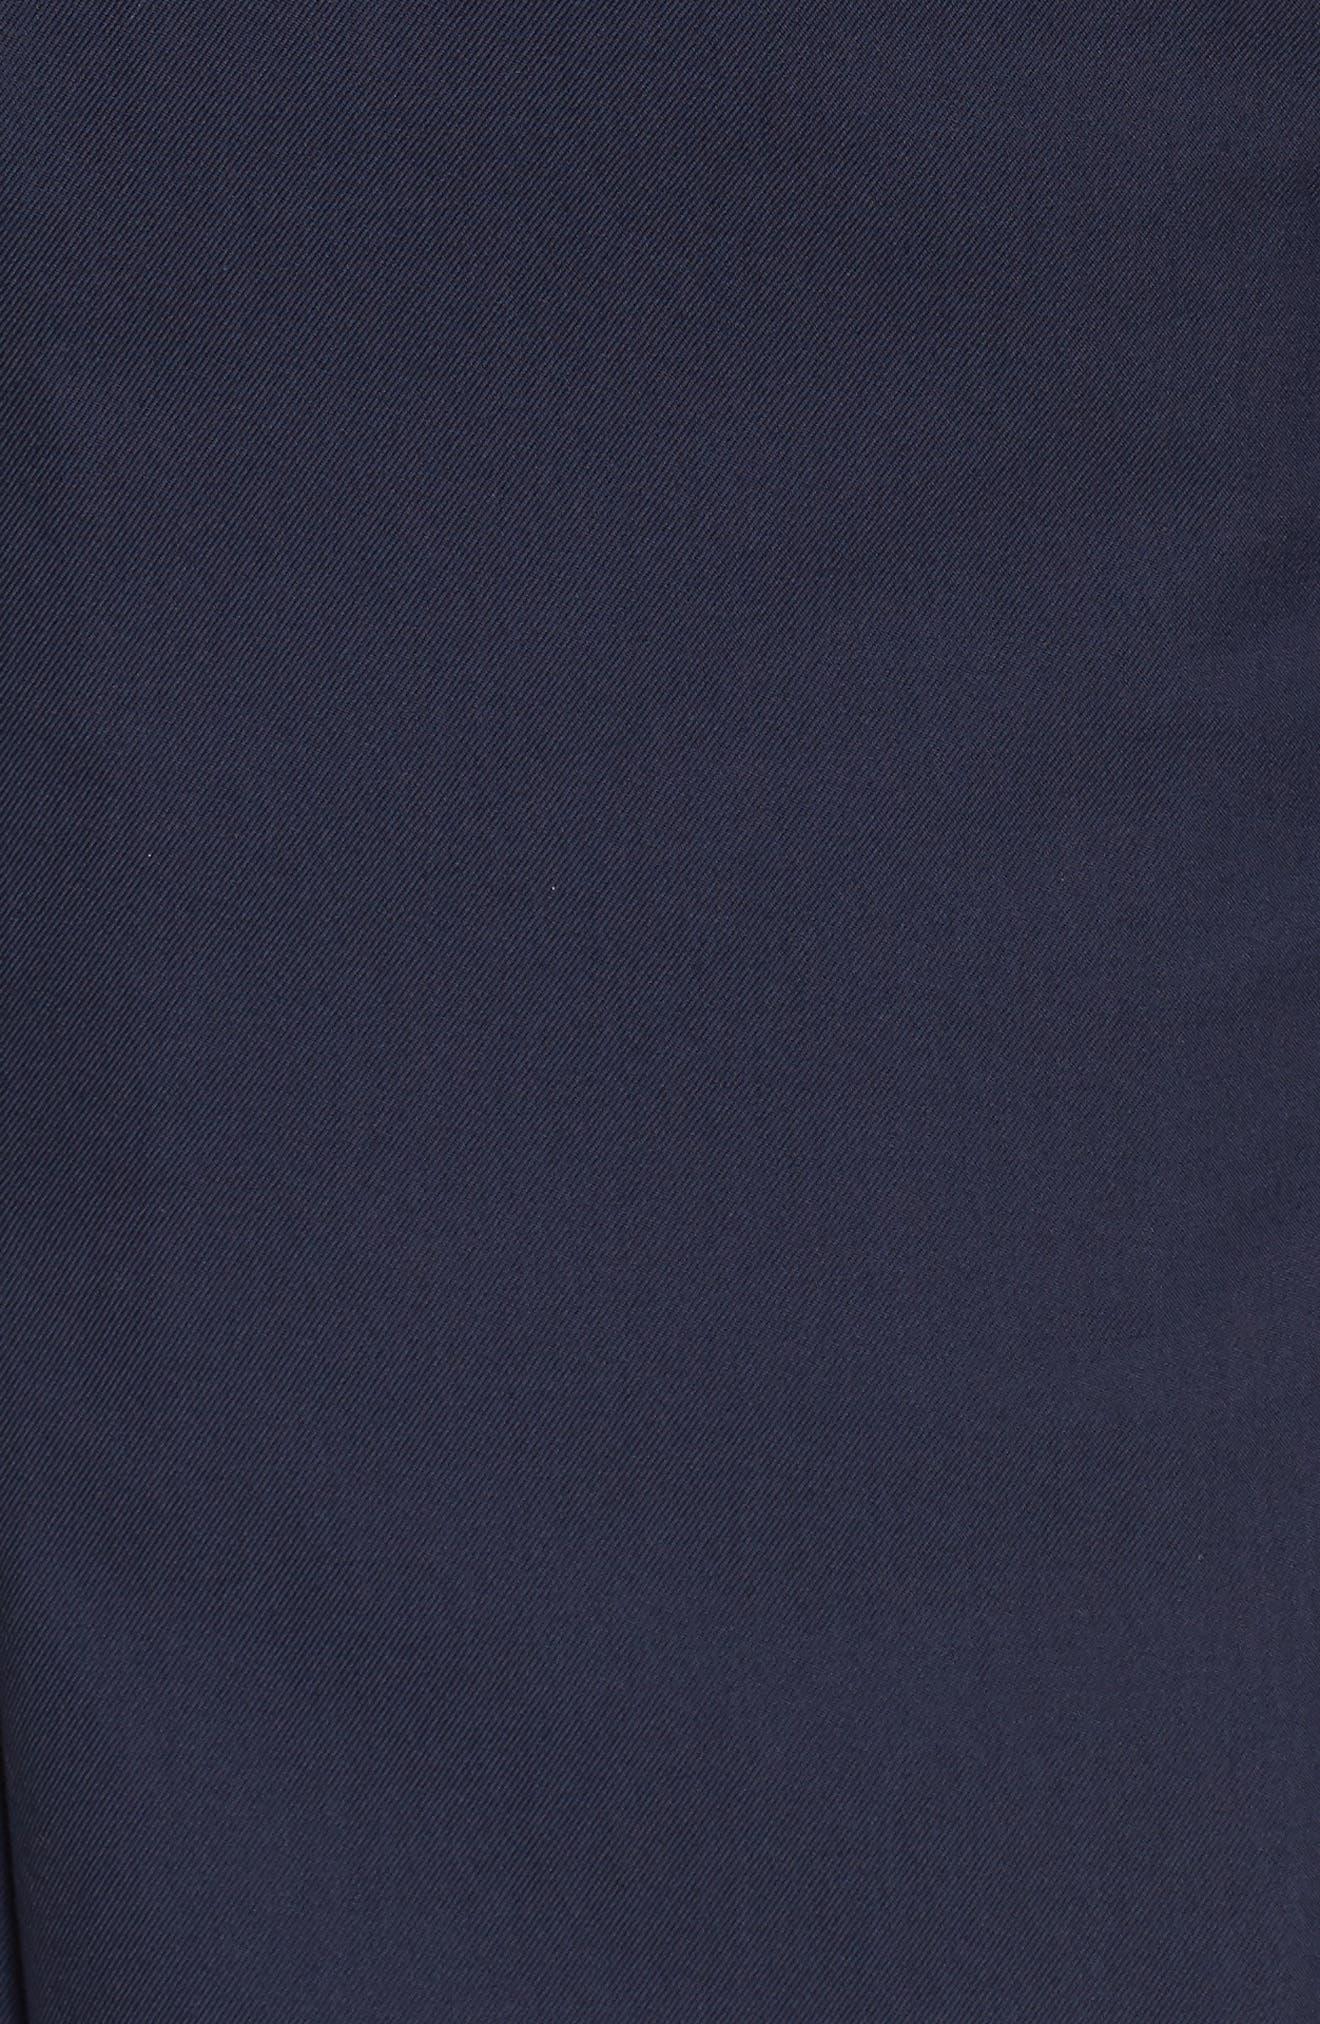 Blouson Sleeve A-Line Twill Dress,                             Alternate thumbnail 5, color,                             Navy Night